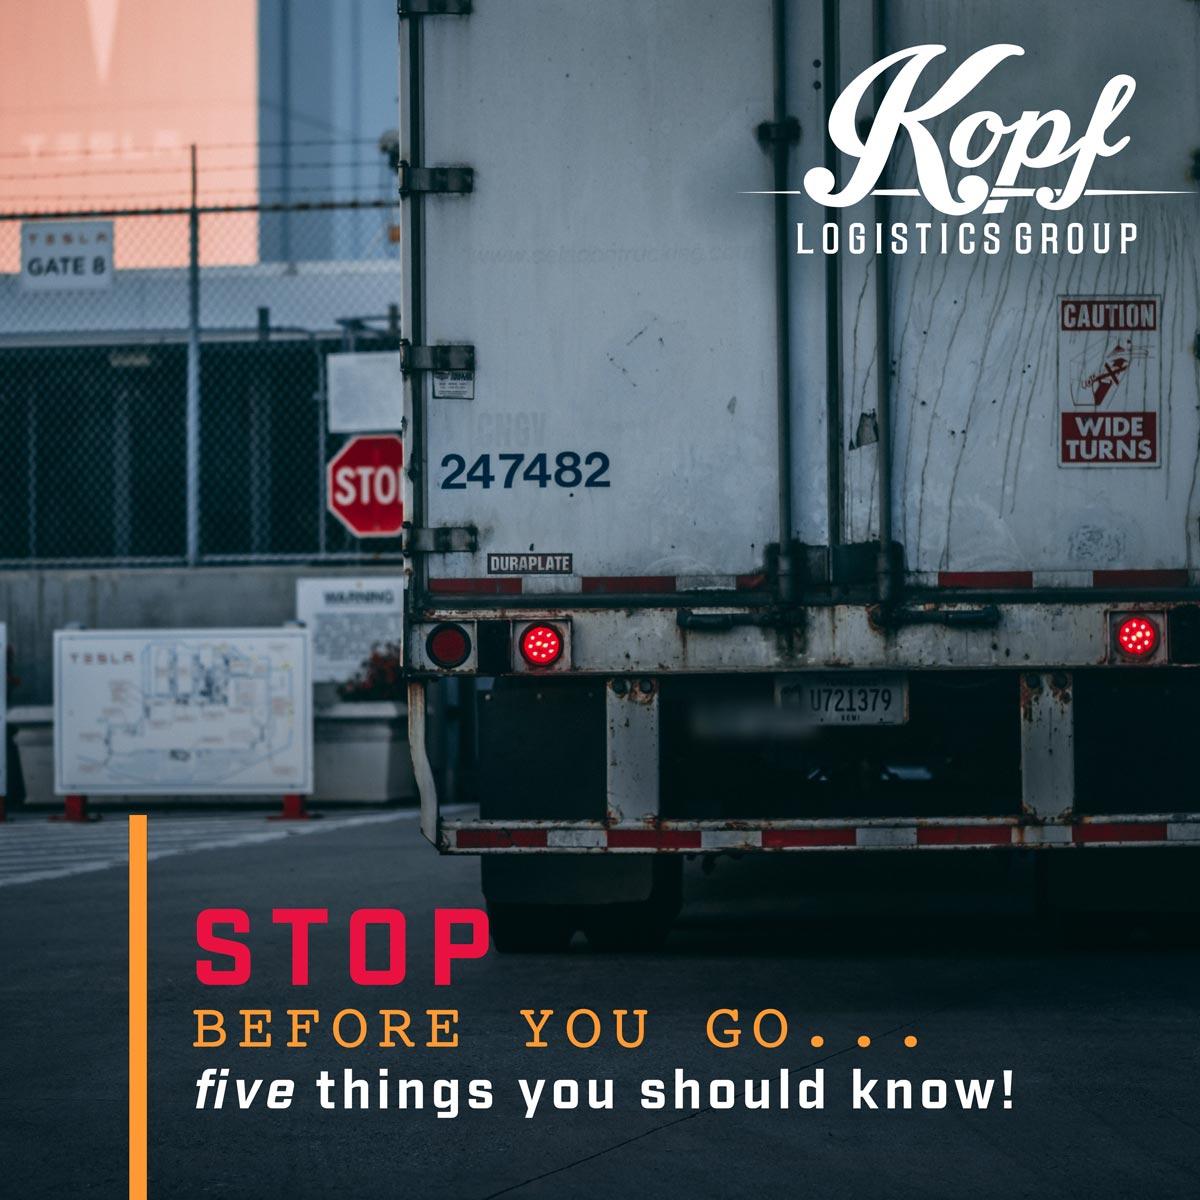 Kopf Logistics Group